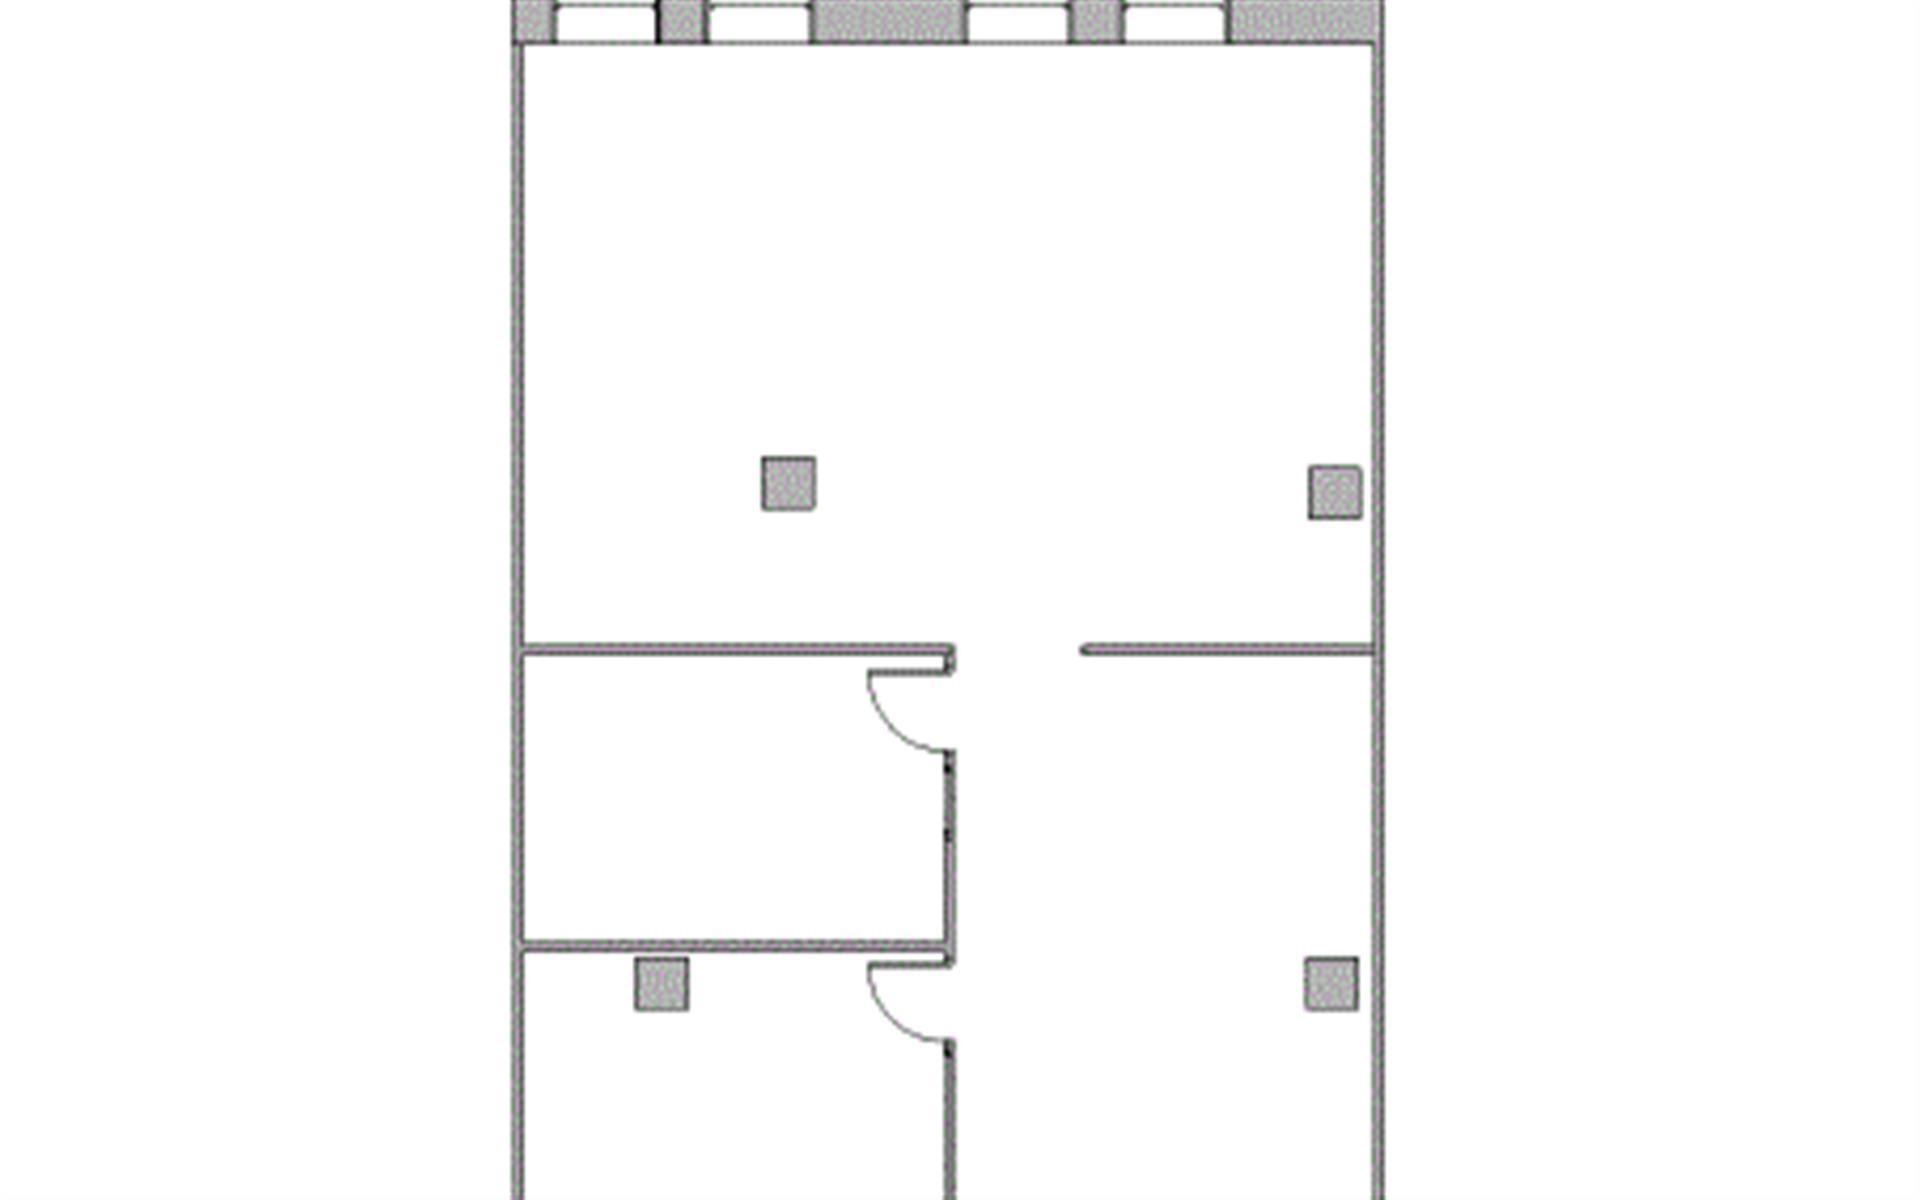 Boxer - The Hurt Building - Team Office | Suite 1620